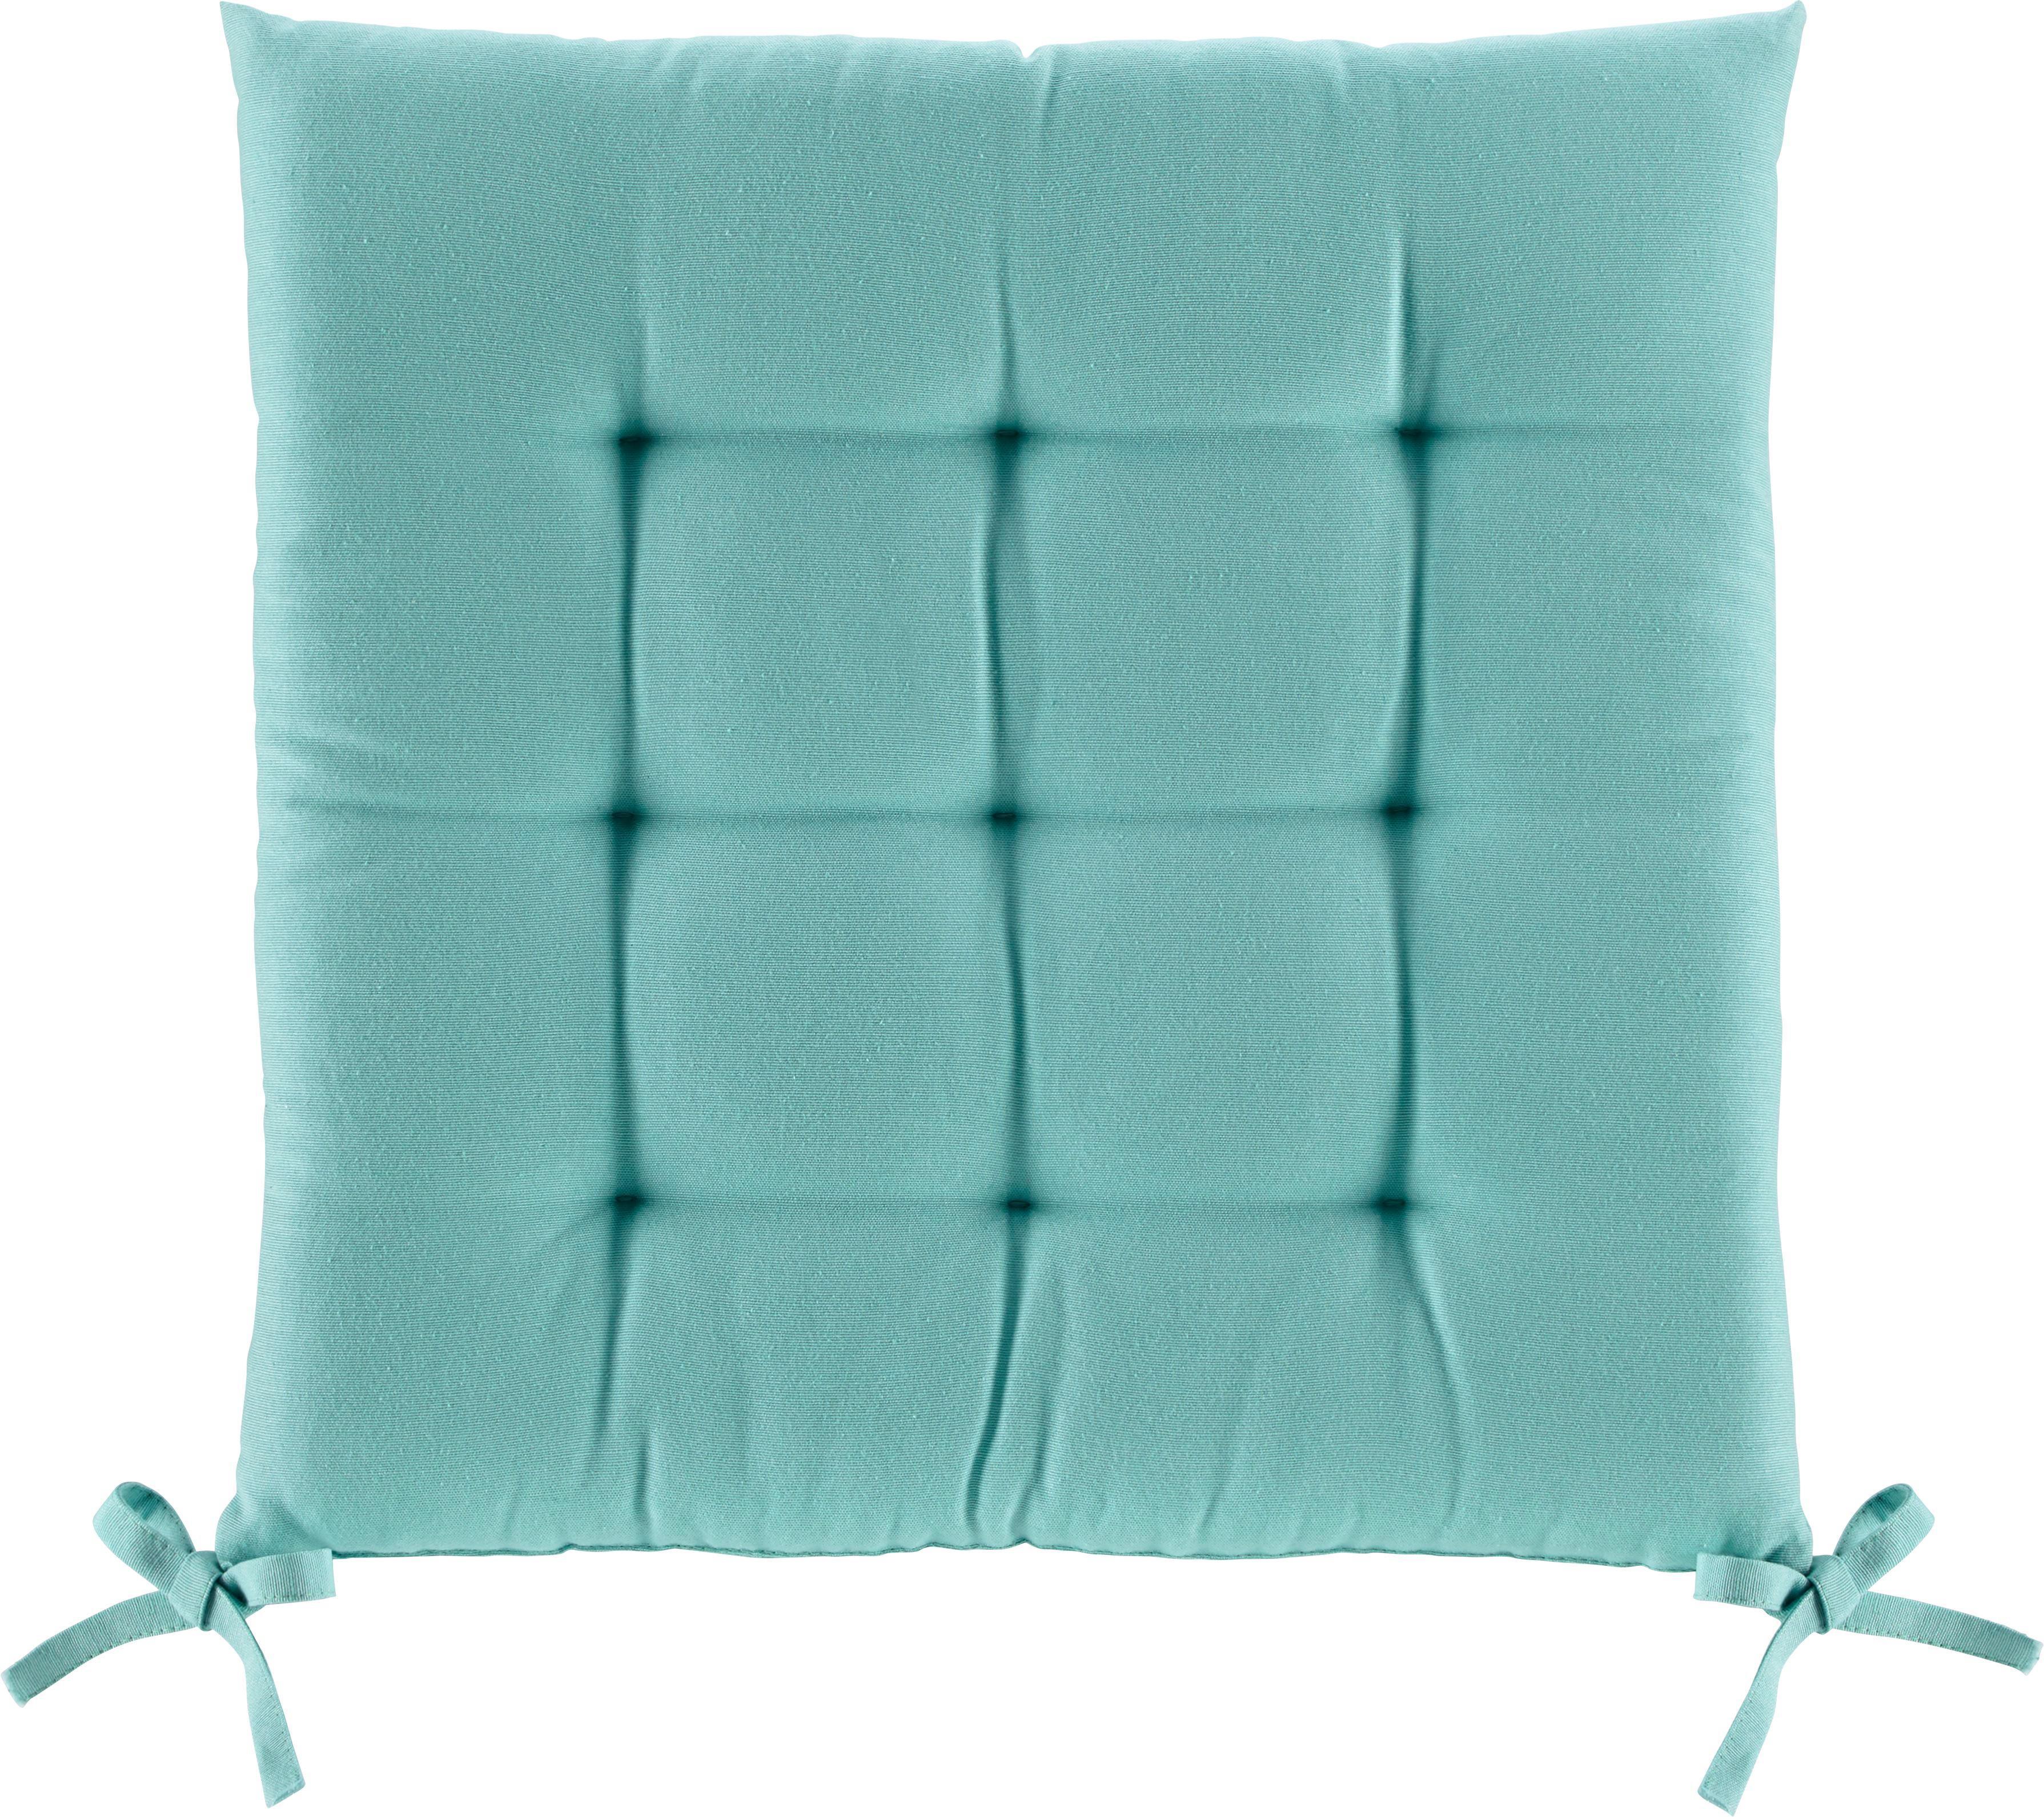 Sedák Anita -ext- - tyrkysová, textil (40/40/4cm) - MÖMAX modern living